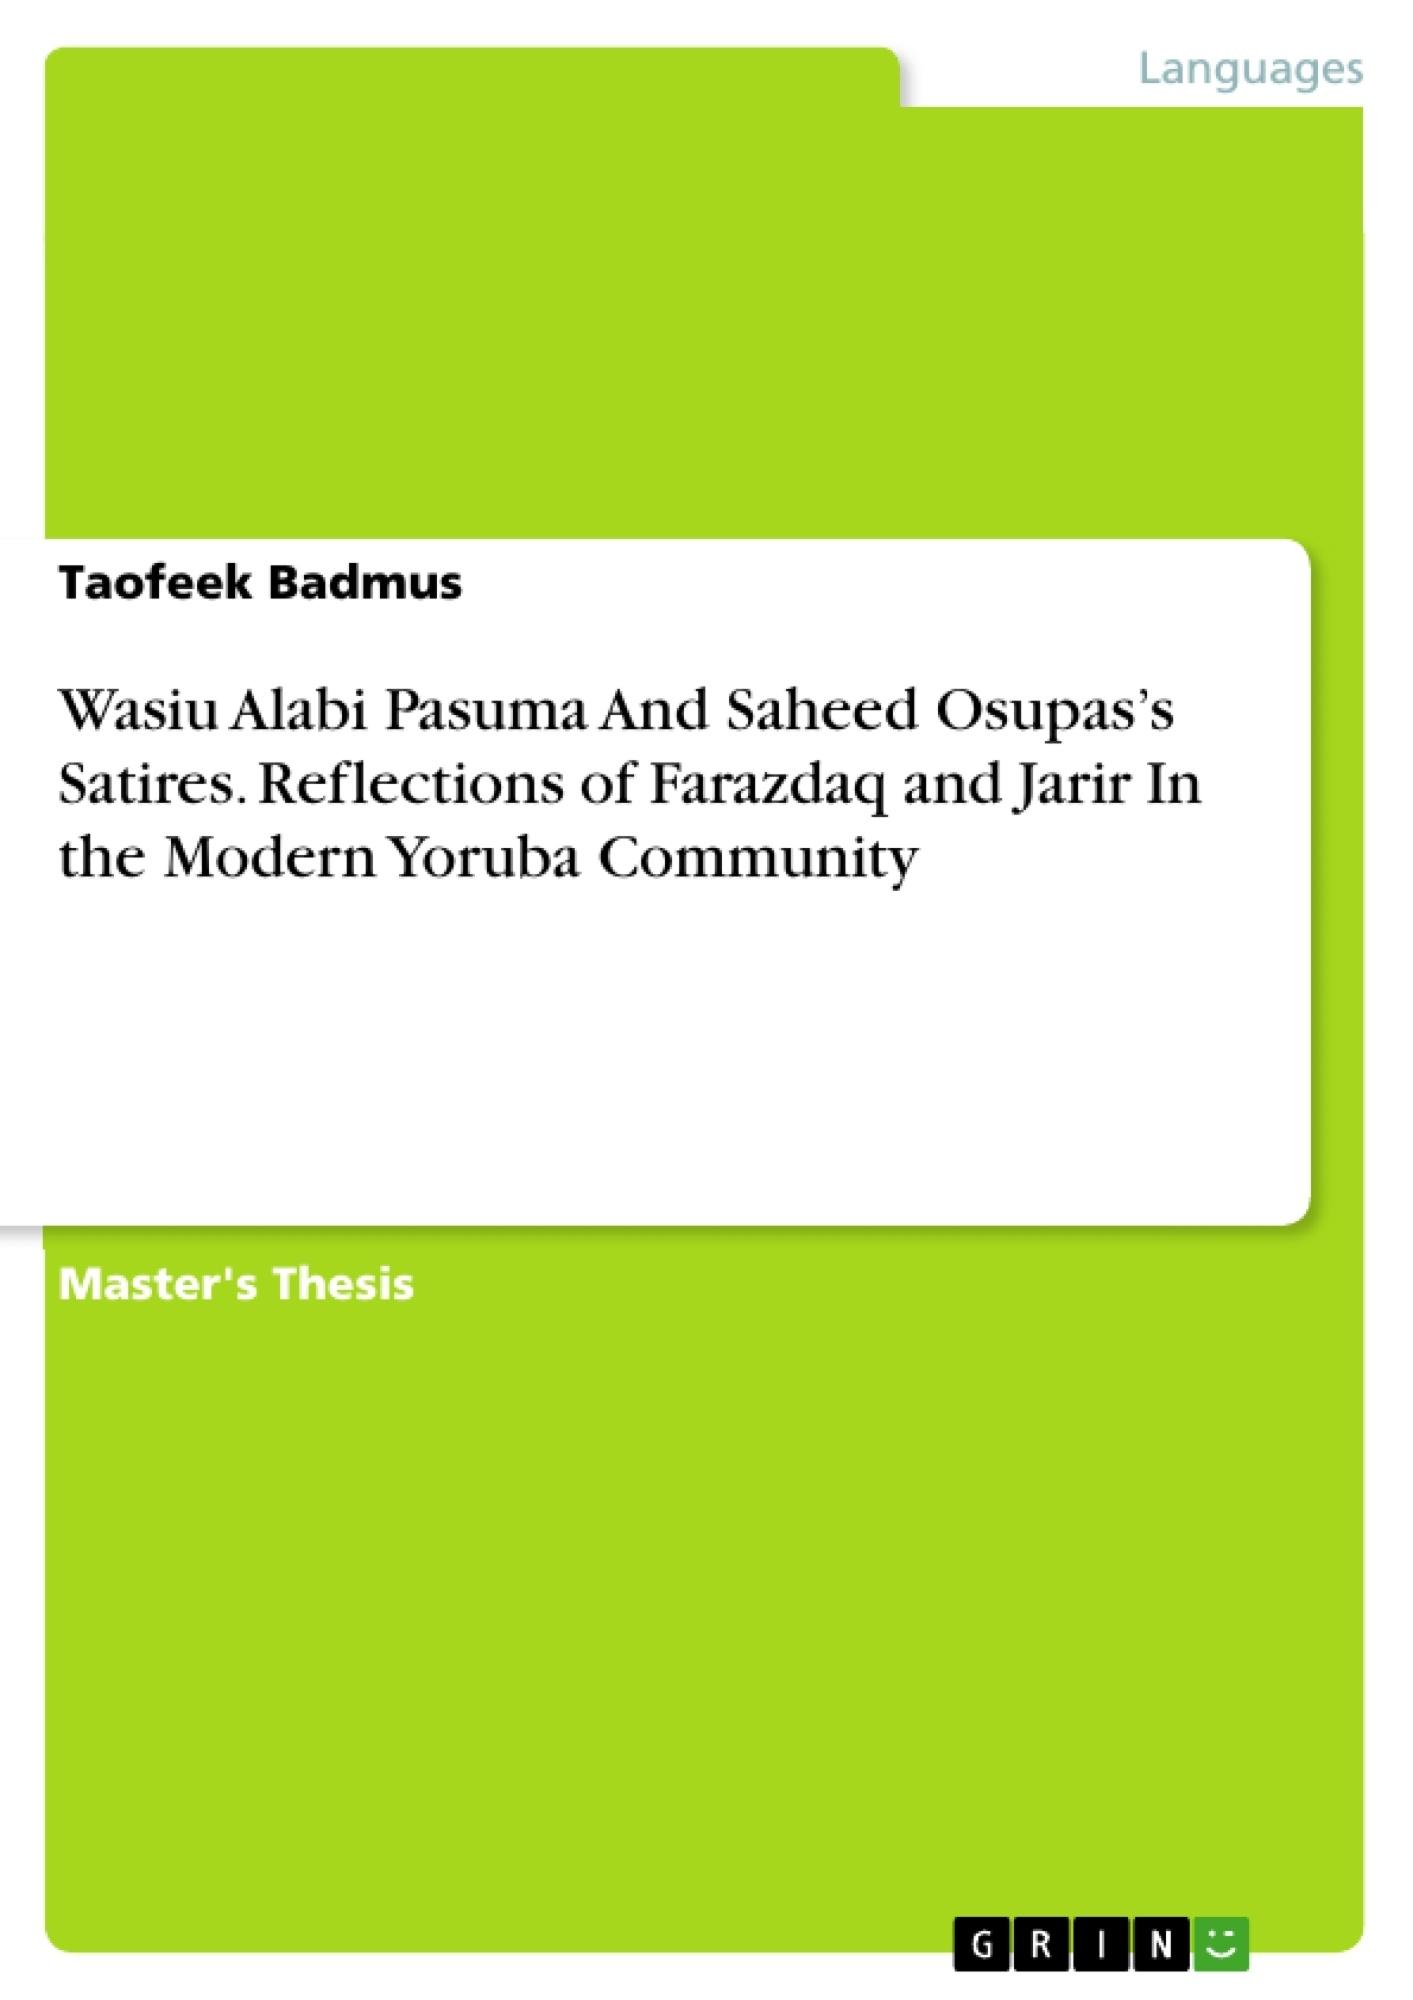 Title: Wasiu Alabi Pasuma And Saheed Osupas's Satires. Reflections of Farazdaq and Jarir In the Modern Yoruba Community